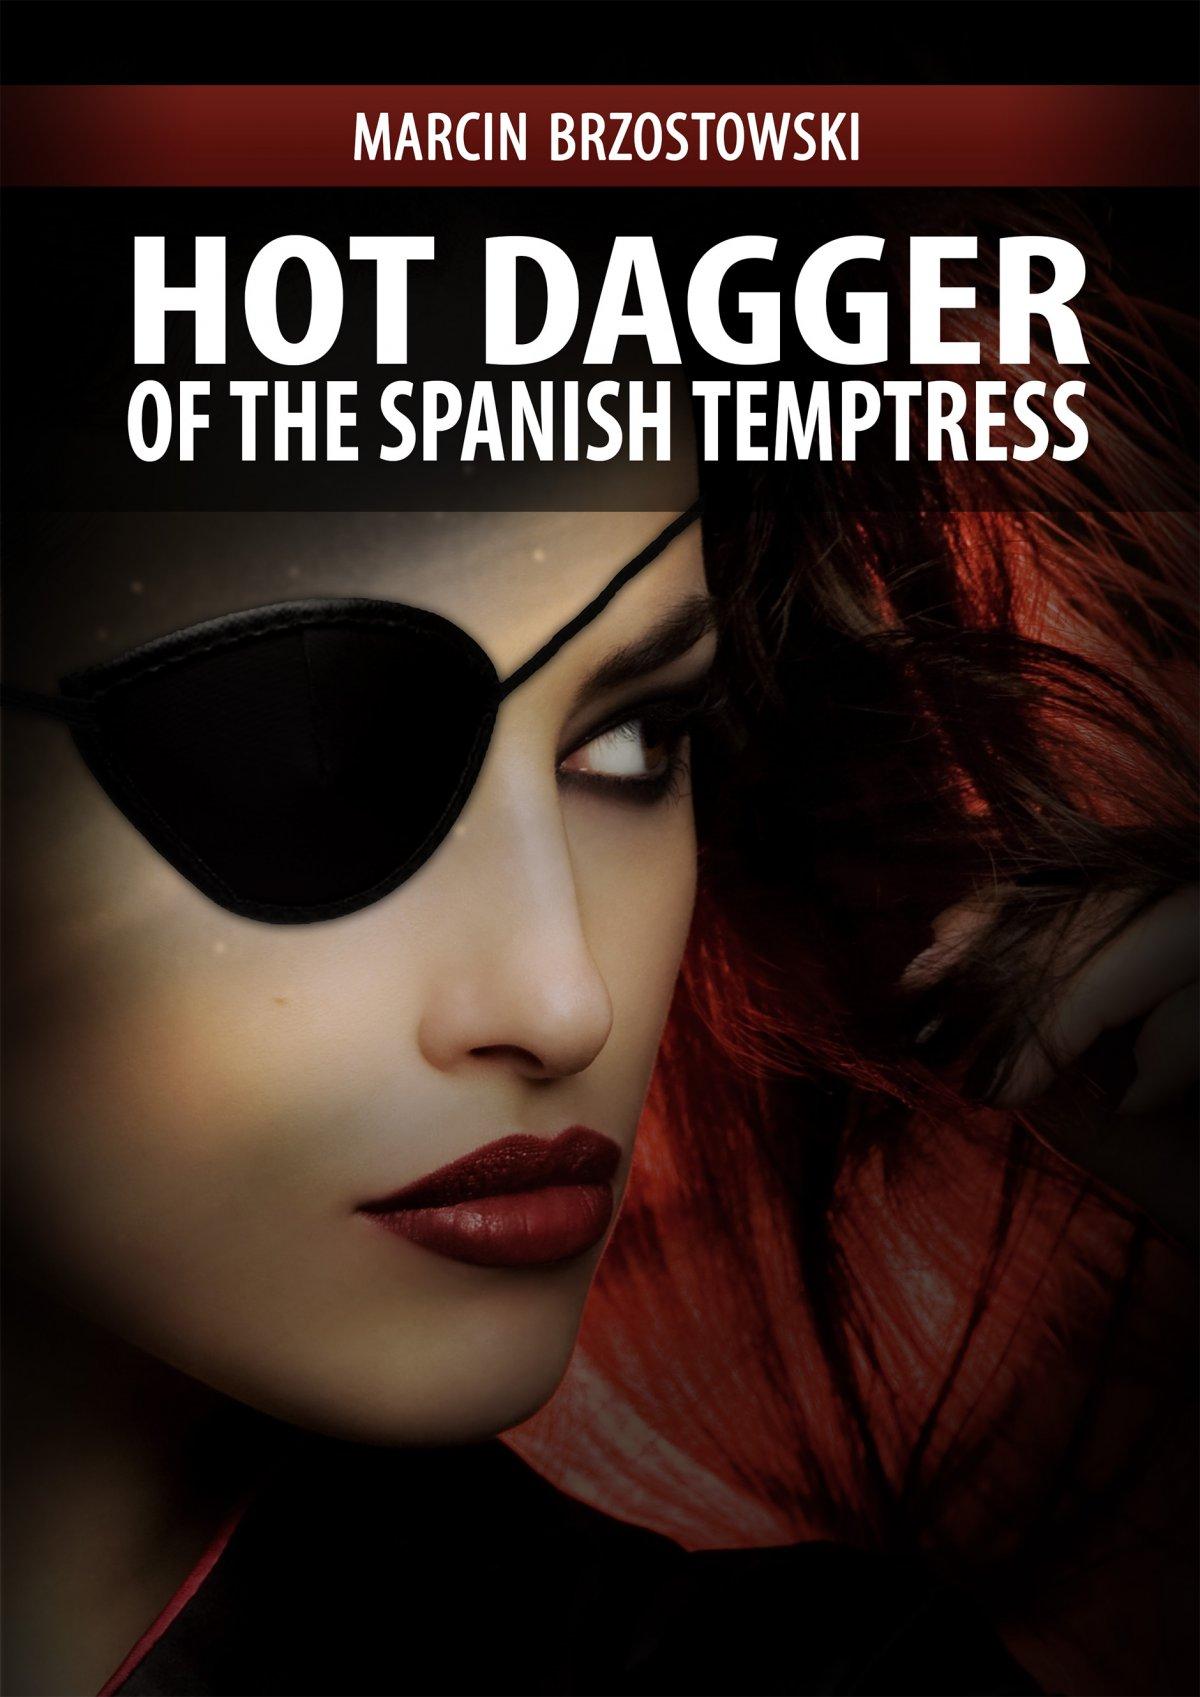 Hot Dagger of the Spanish Temptress - Ebook (Książka na Kindle) do pobrania w formacie MOBI